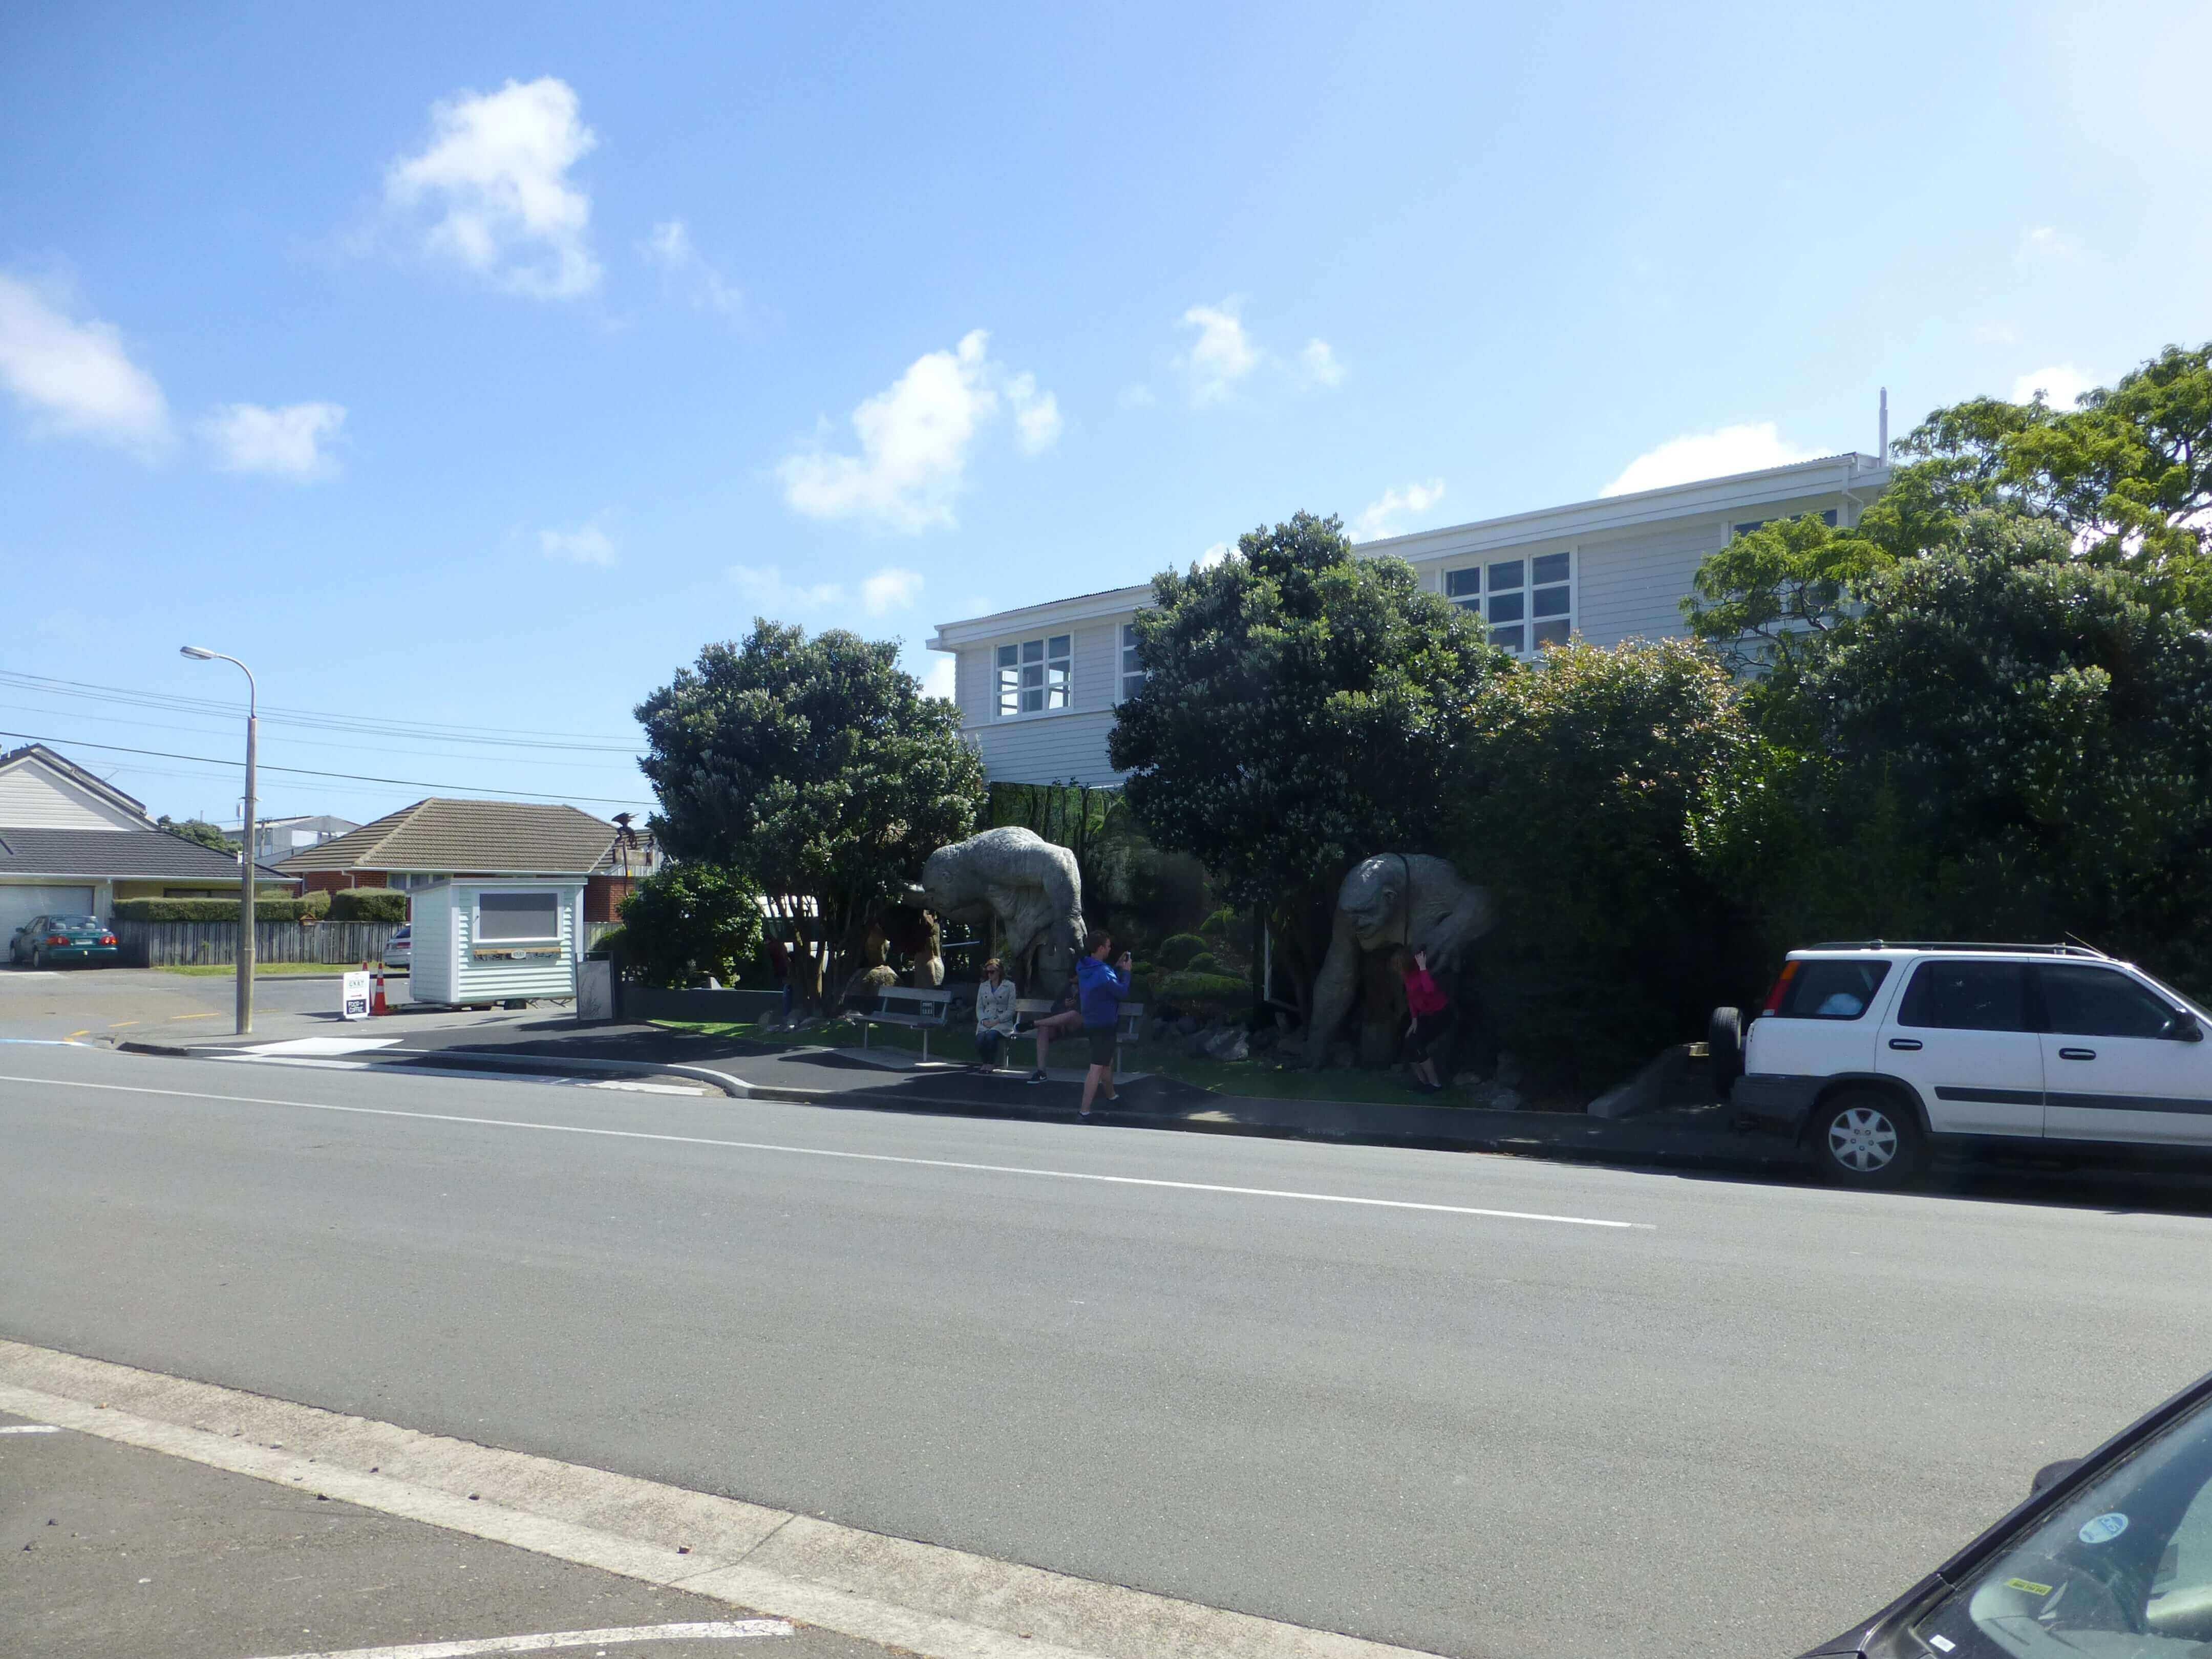 Wellington, in Miramar auf dem Weg zum Weta Shop, Weit-weg.reisen 2